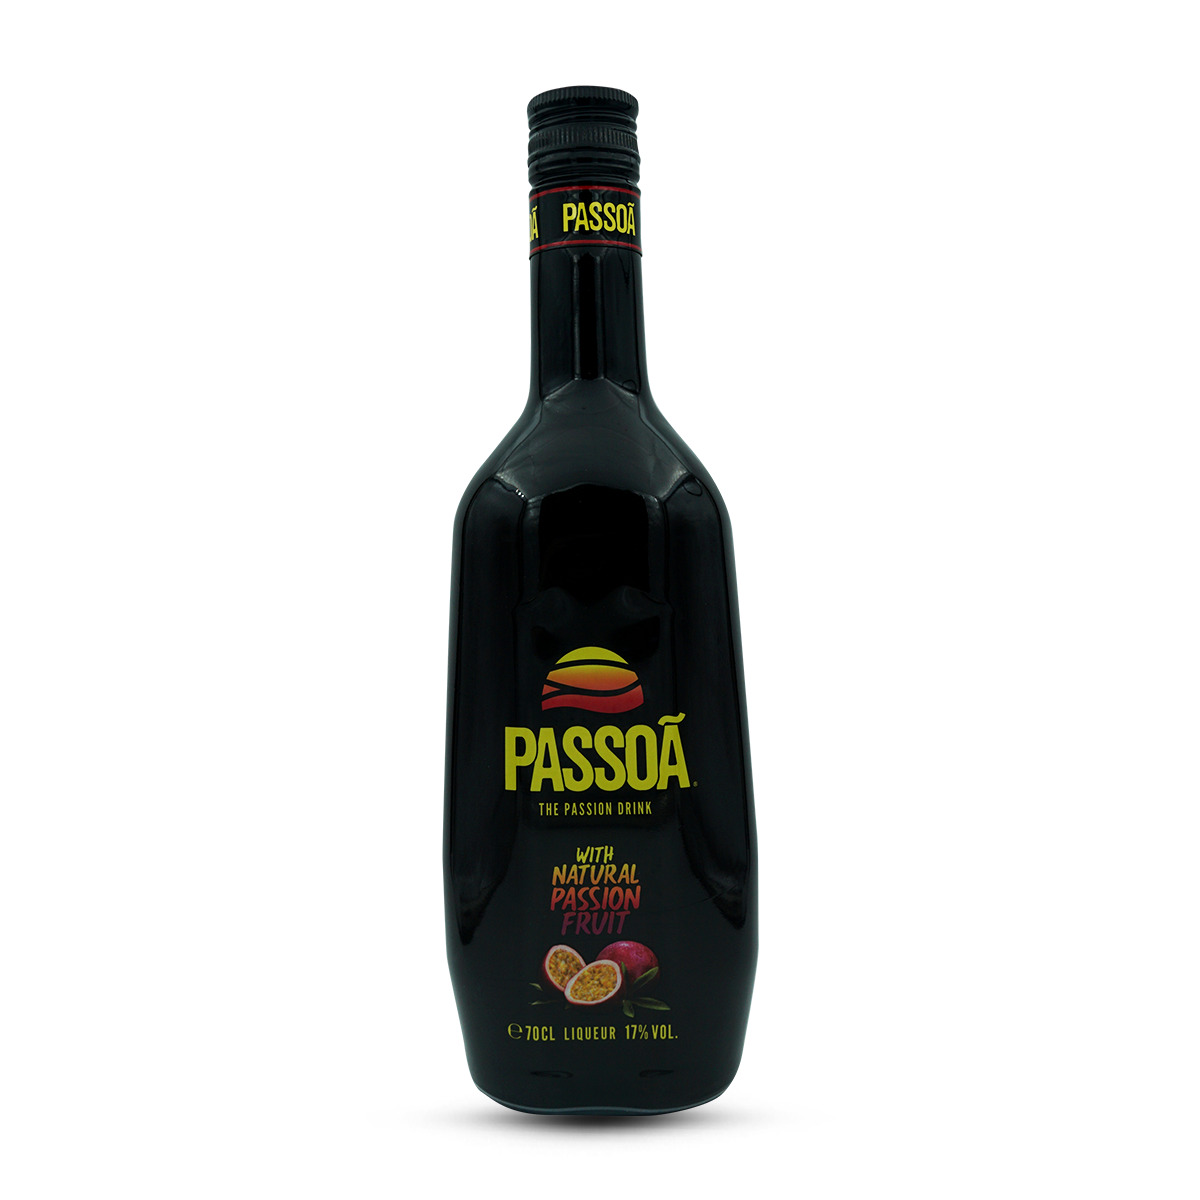 PASSOÃ Passion